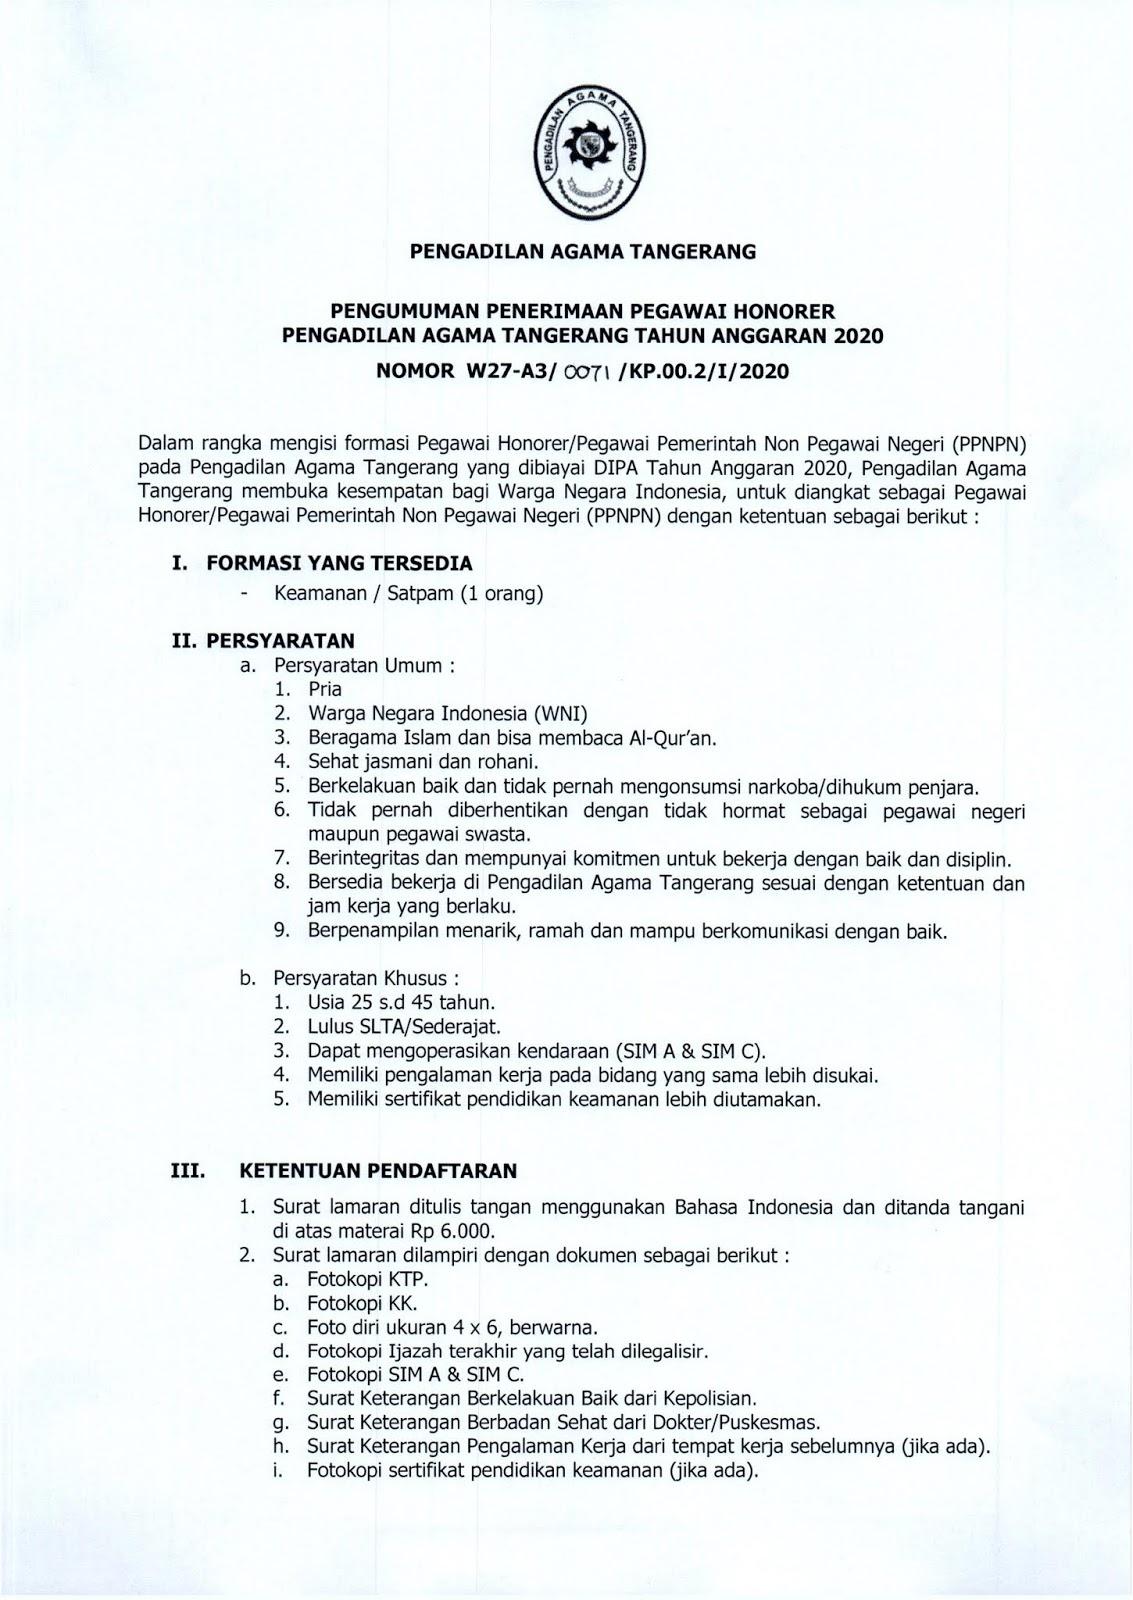 Lowongan Kerja Pegawai Non PNS Pengadilan Agama Tangerang Bulan Januari 2020